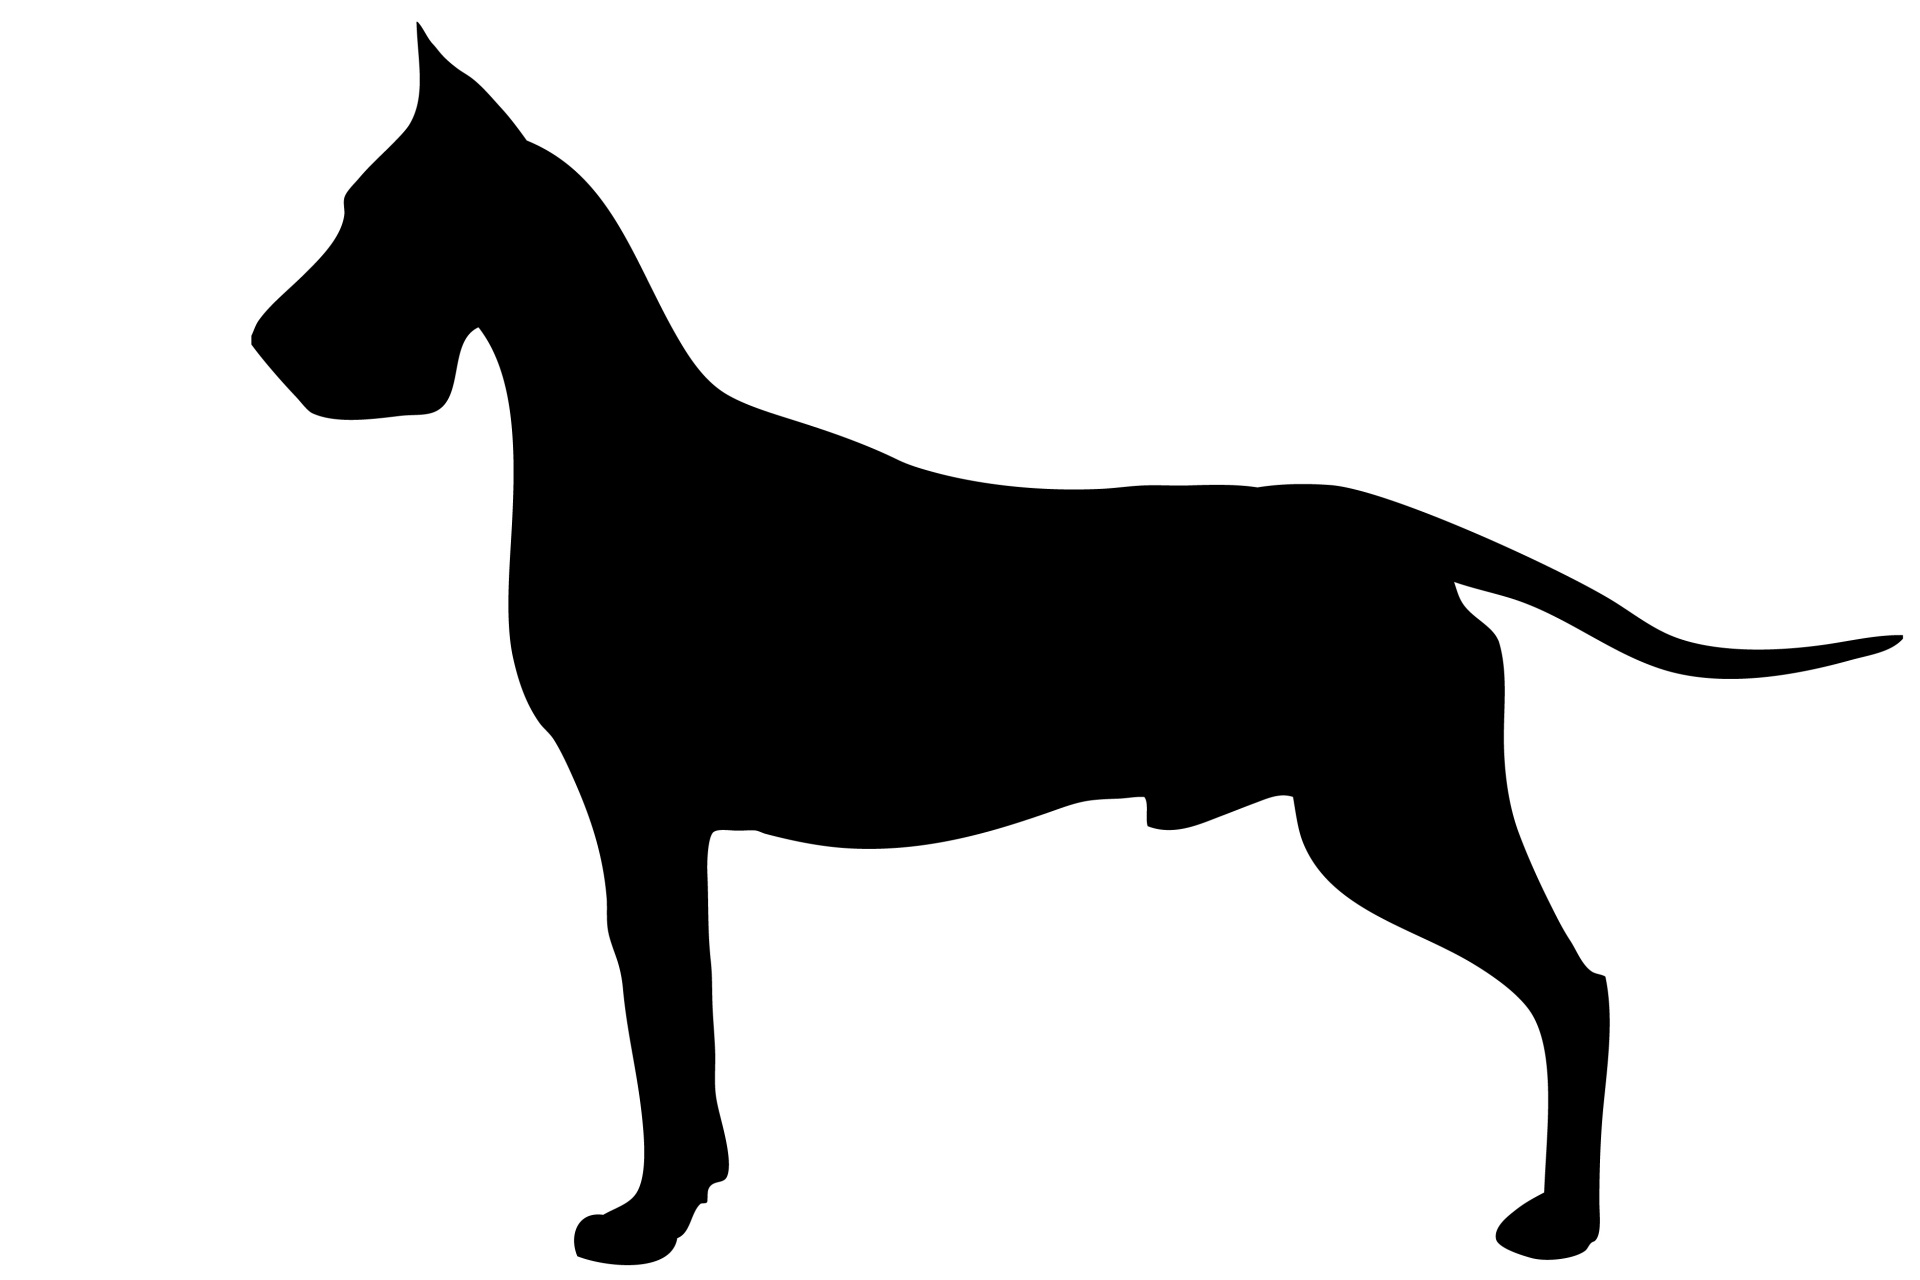 1920x1280 Dog, Great Dane Black Silhouette Free Stock Photo